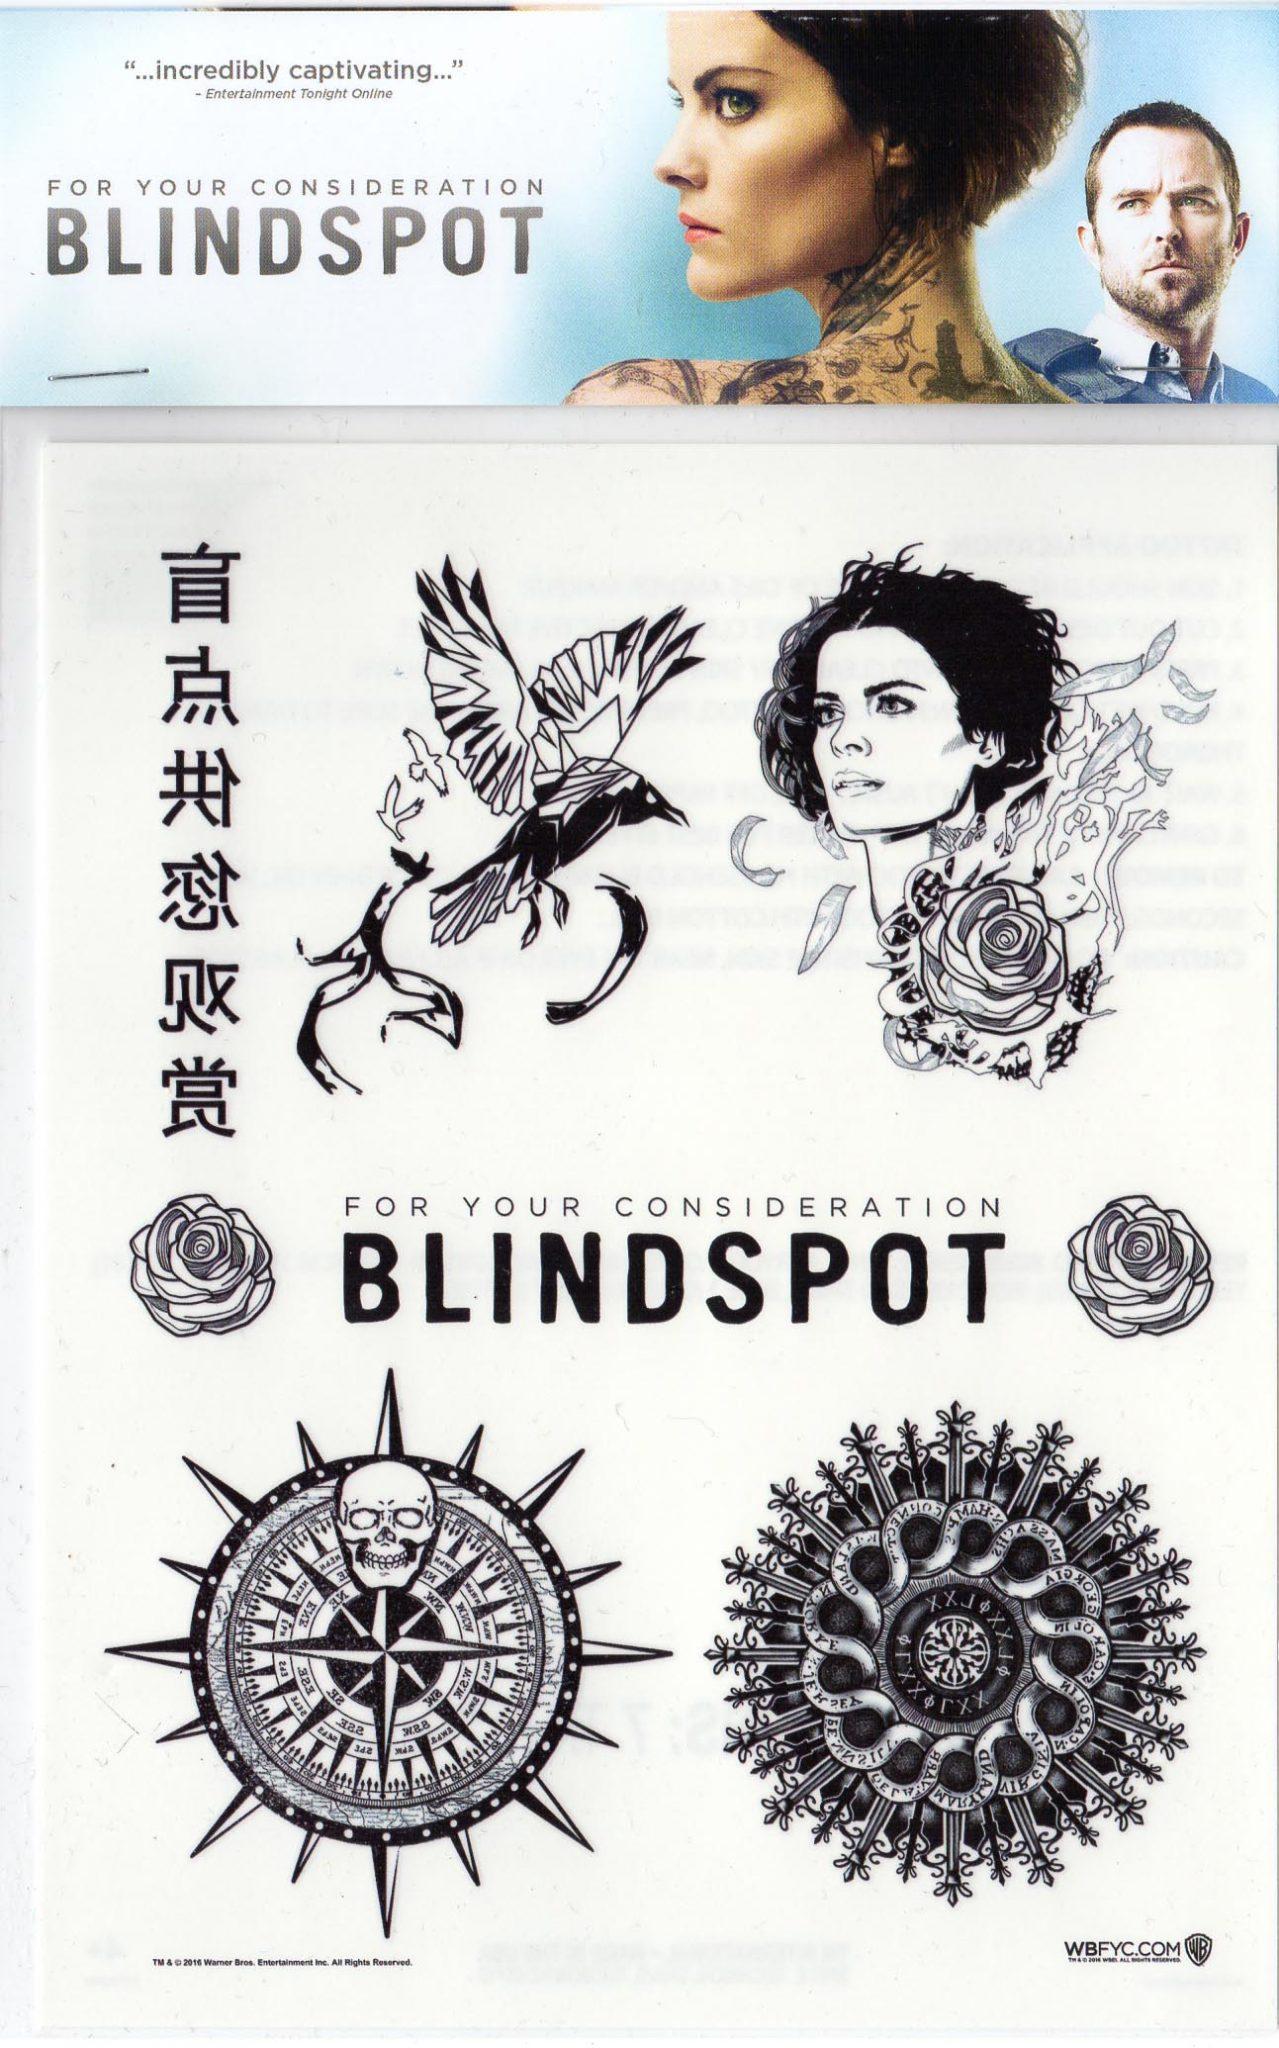 7 Blindspot Temporary Tattoos From Warner Bros At Sdcc